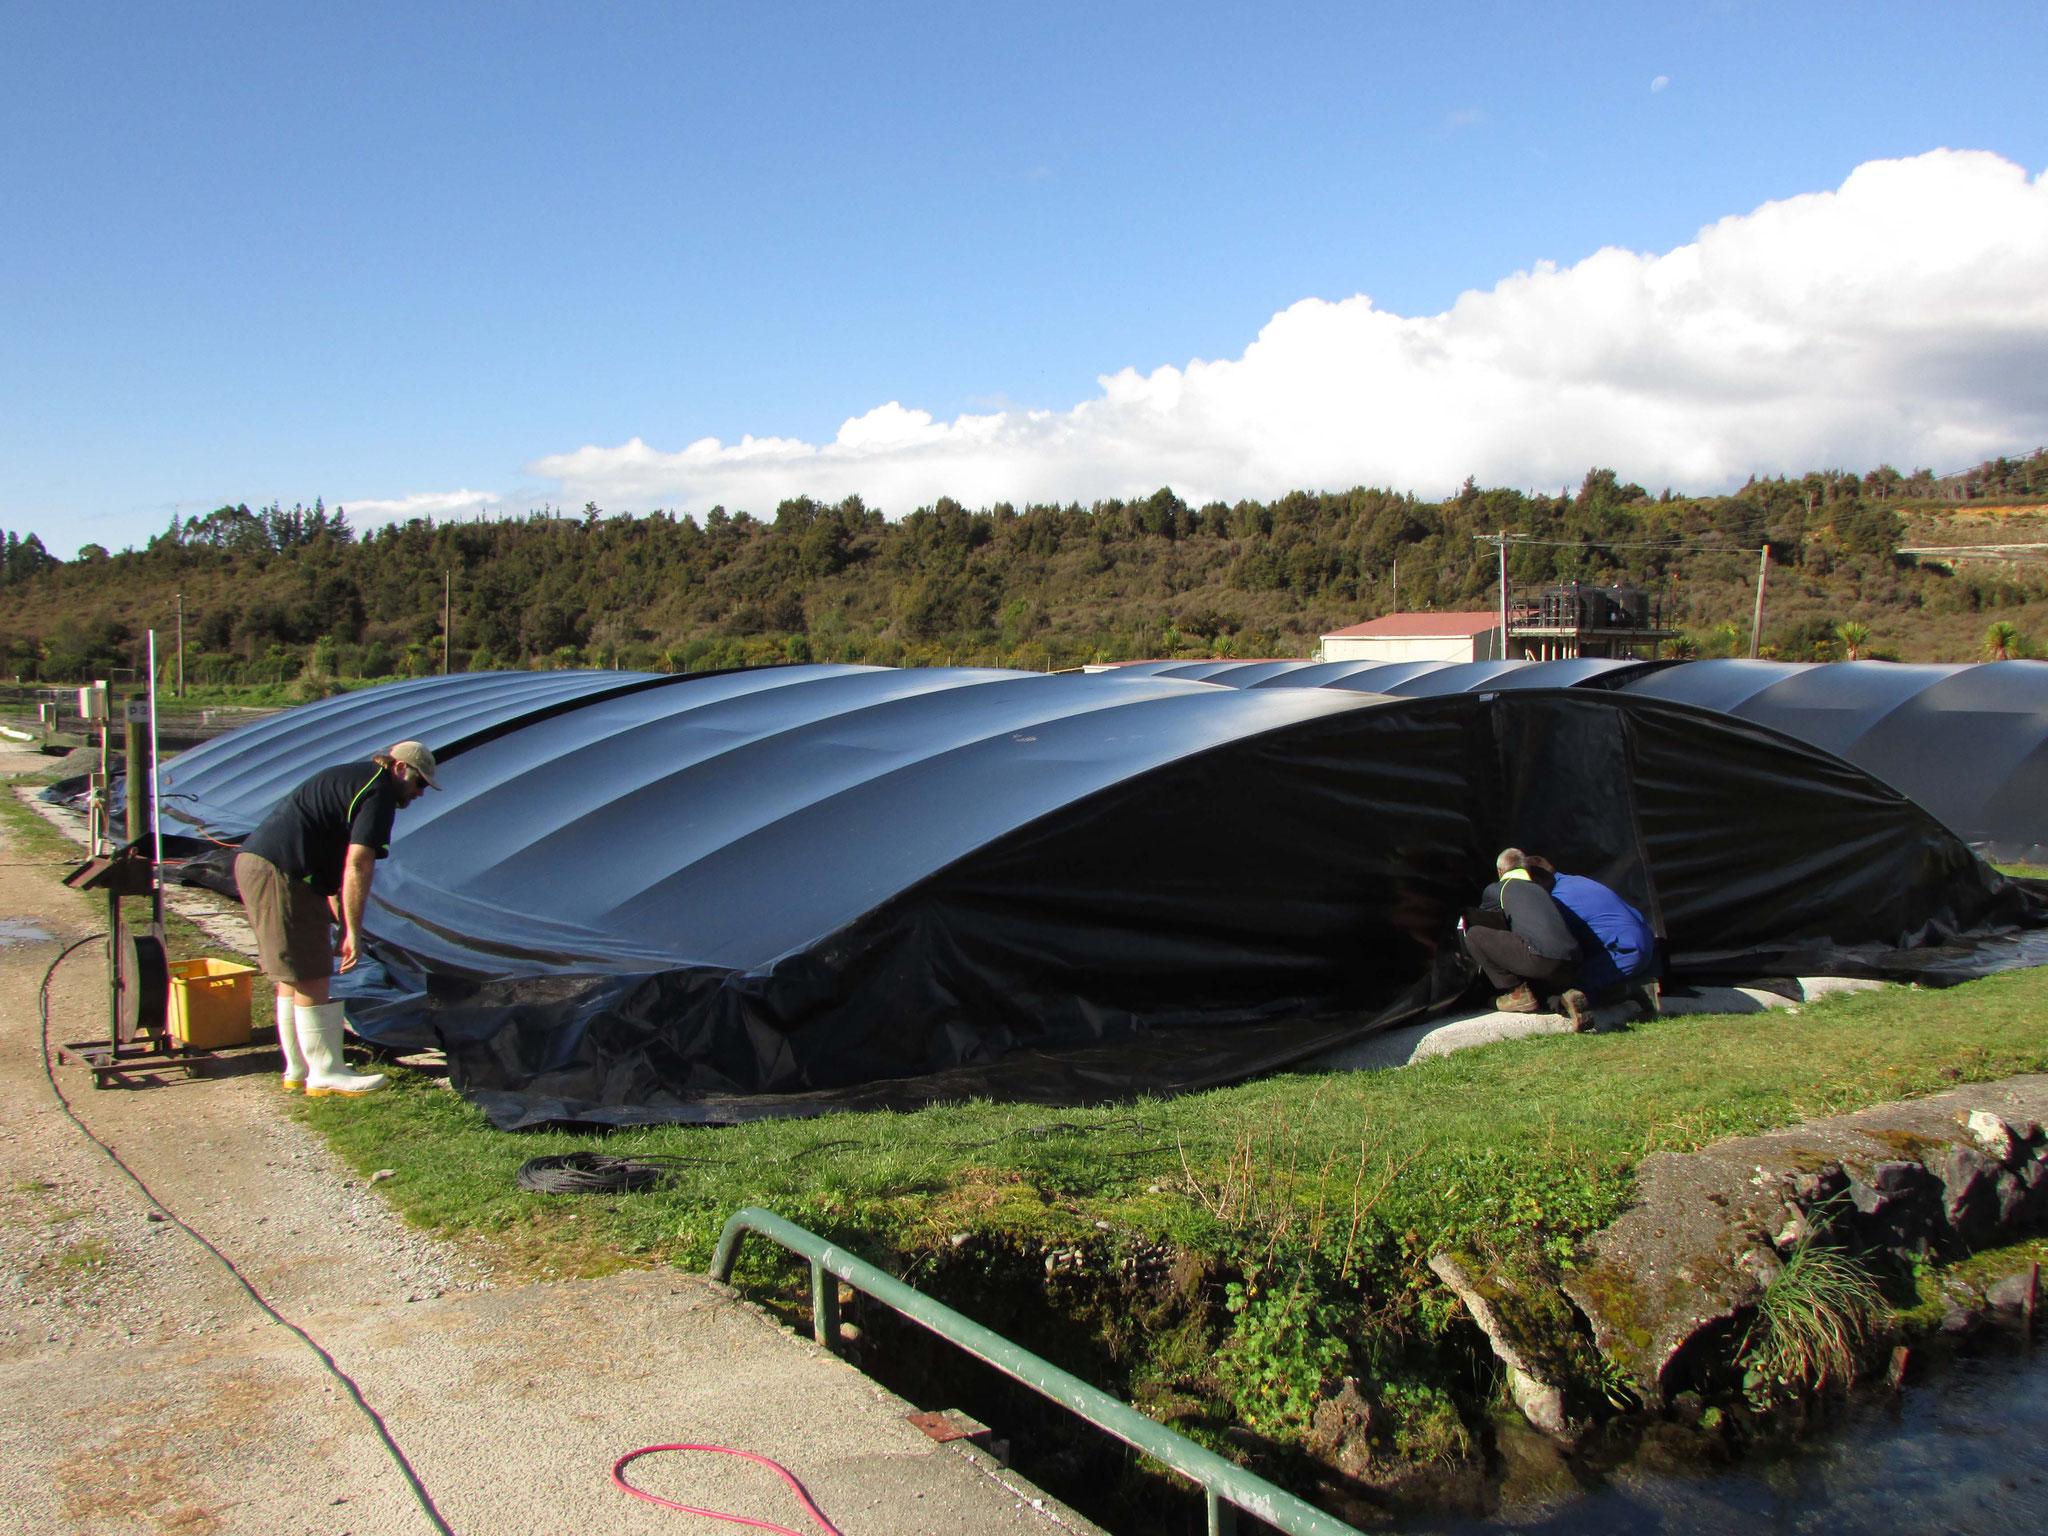 Fish Hatchery Covers, Takaka, New Zealand